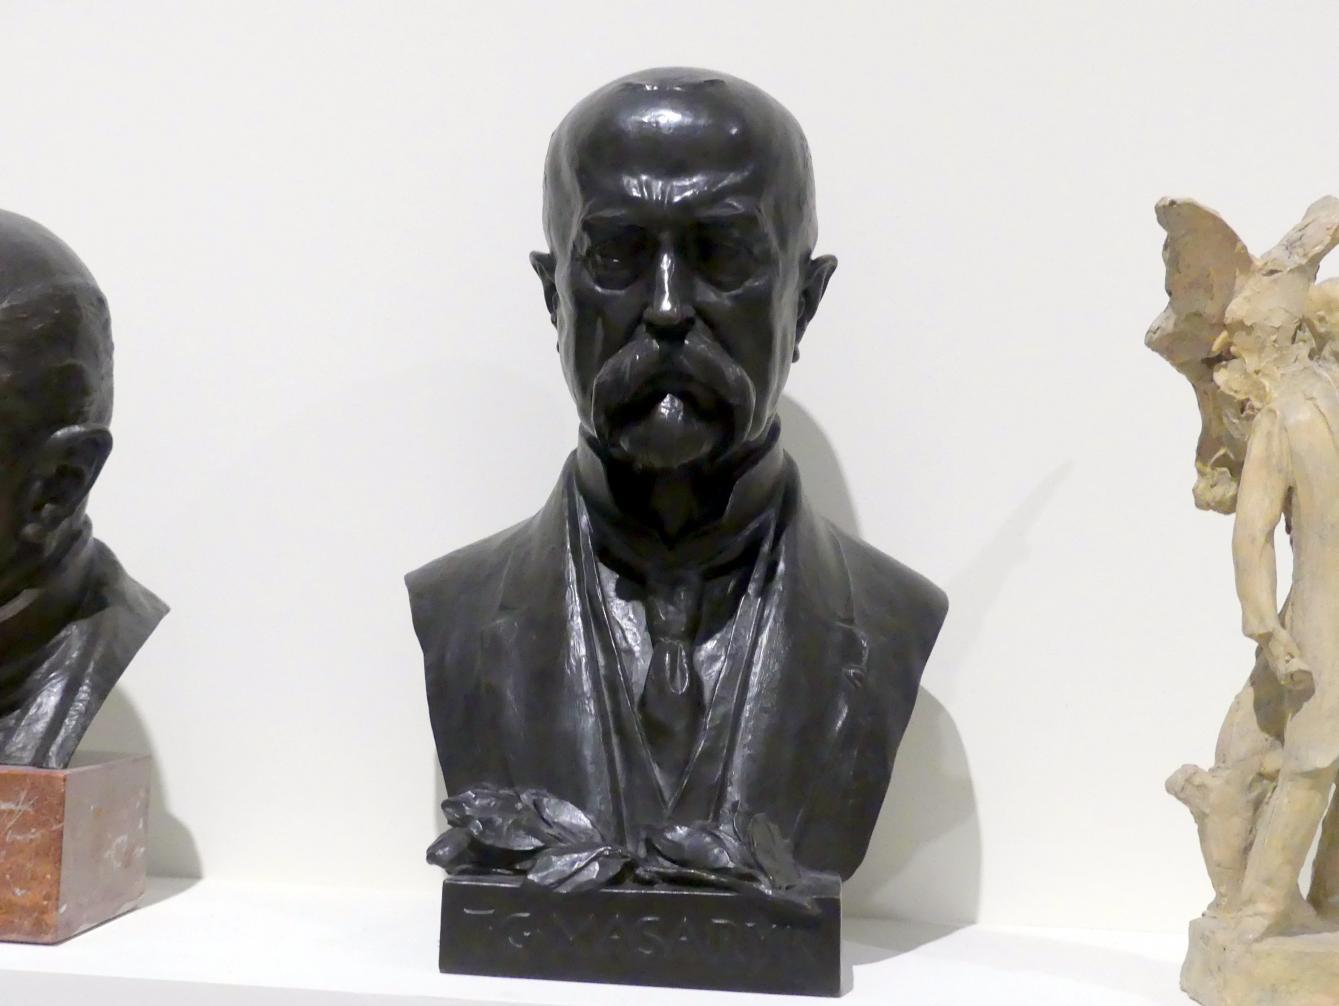 Bohumil Kafka: Büste Tomáš Garrigue Masaryk, 1925